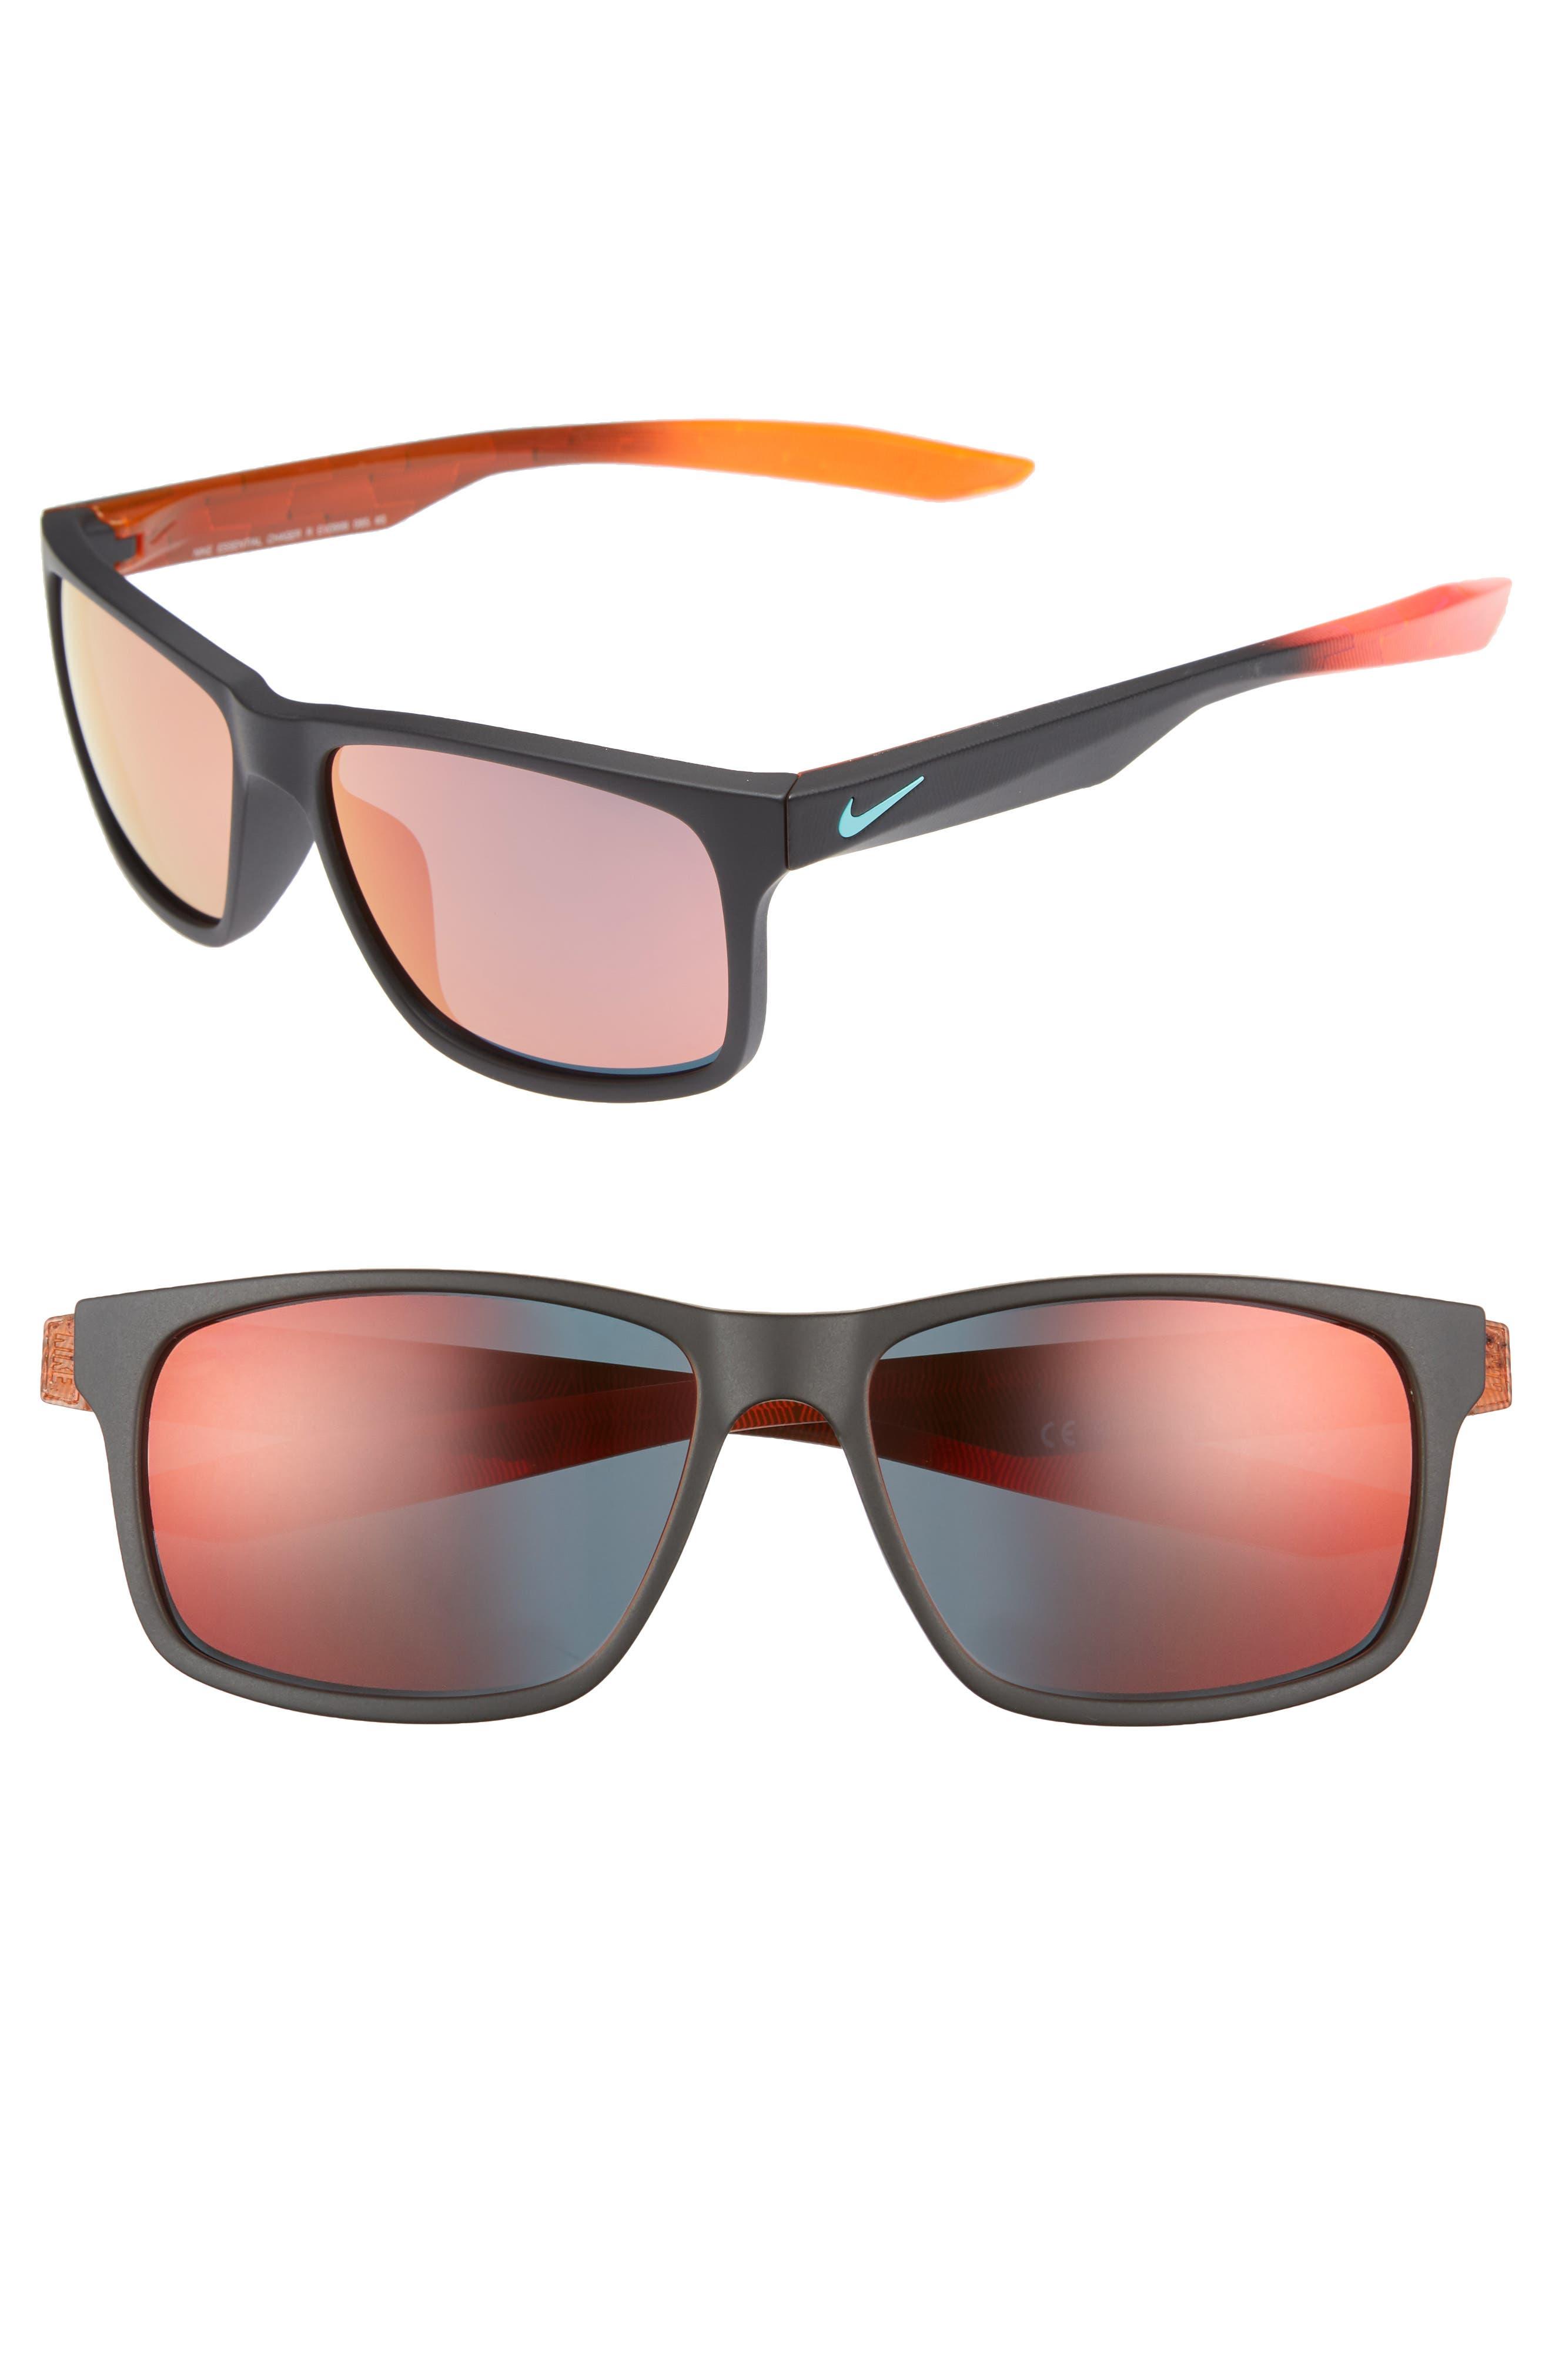 Nike Essential Chaser 57Mm Reflective Sunglasses - Matte Black/ Amaranthine